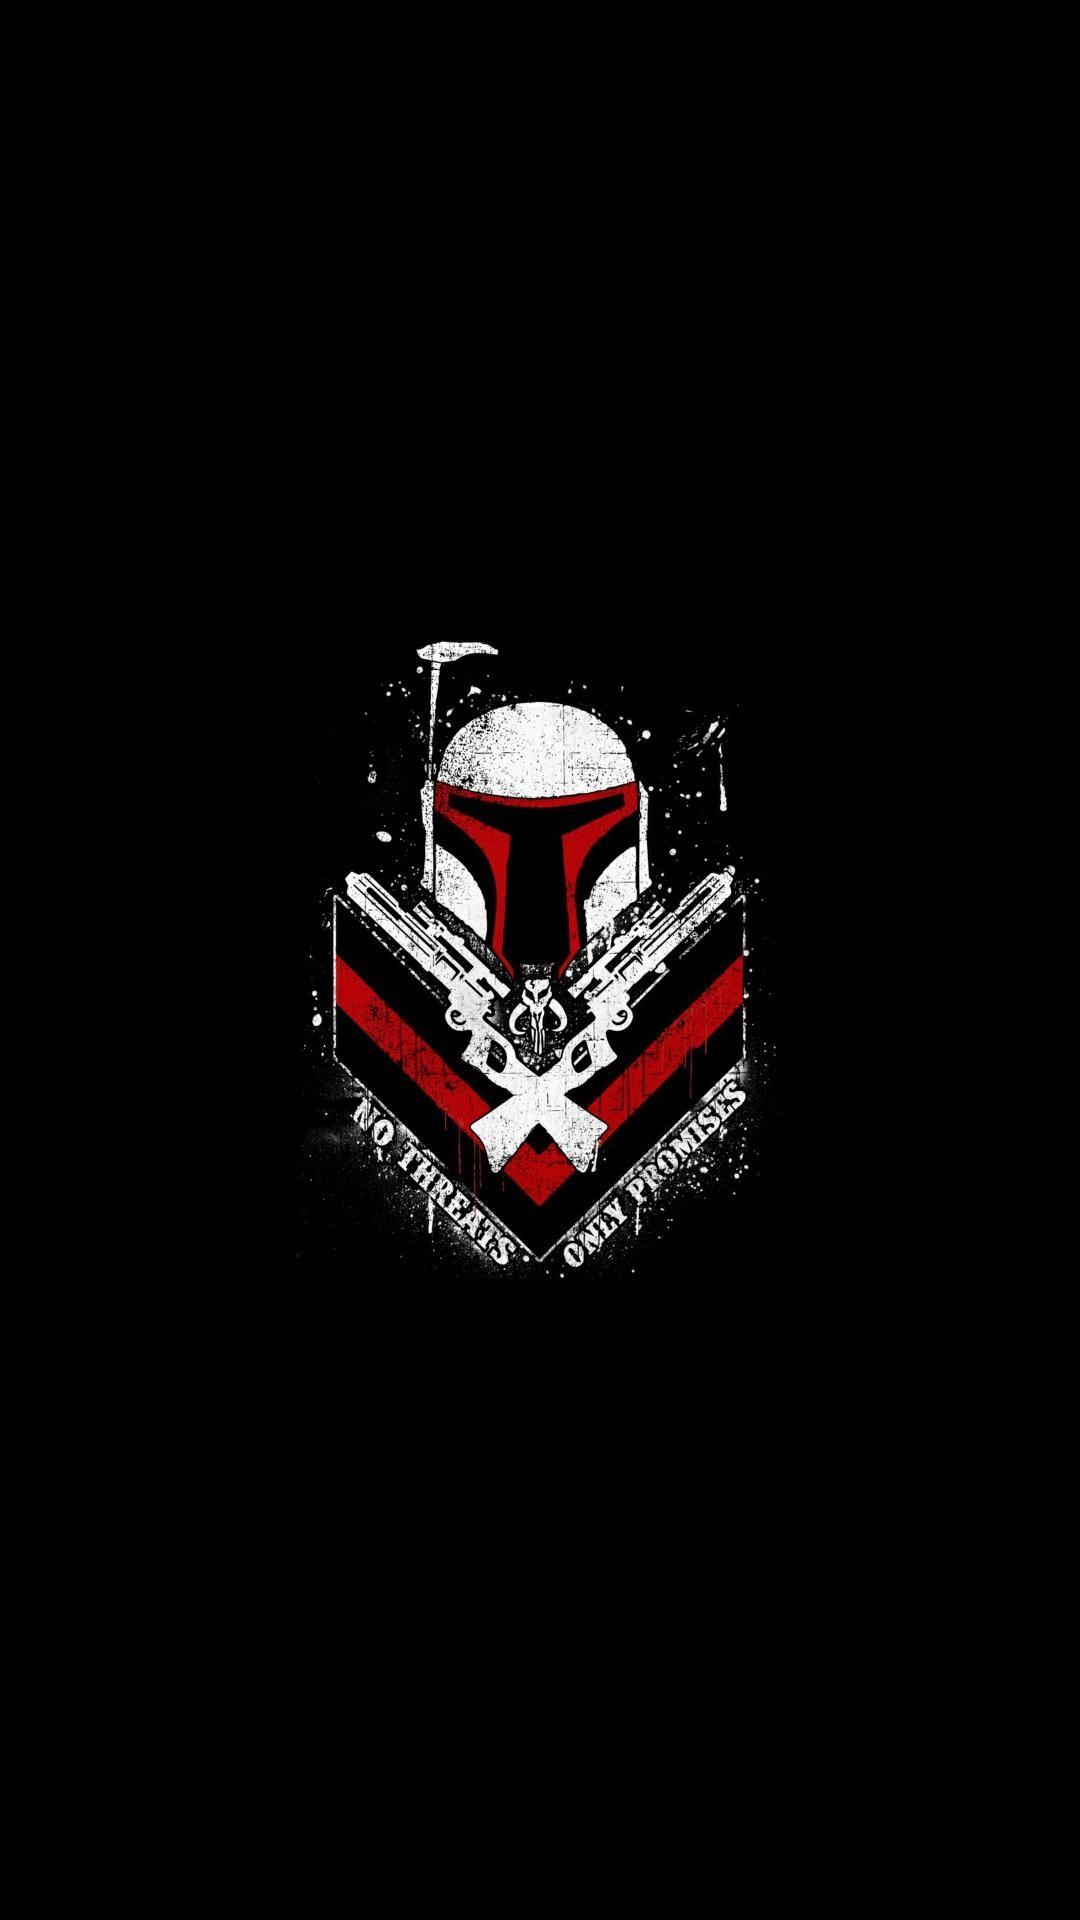 Star Wars Amoled Wallpapers Pt Emblem 49273 Hd Wallpaper